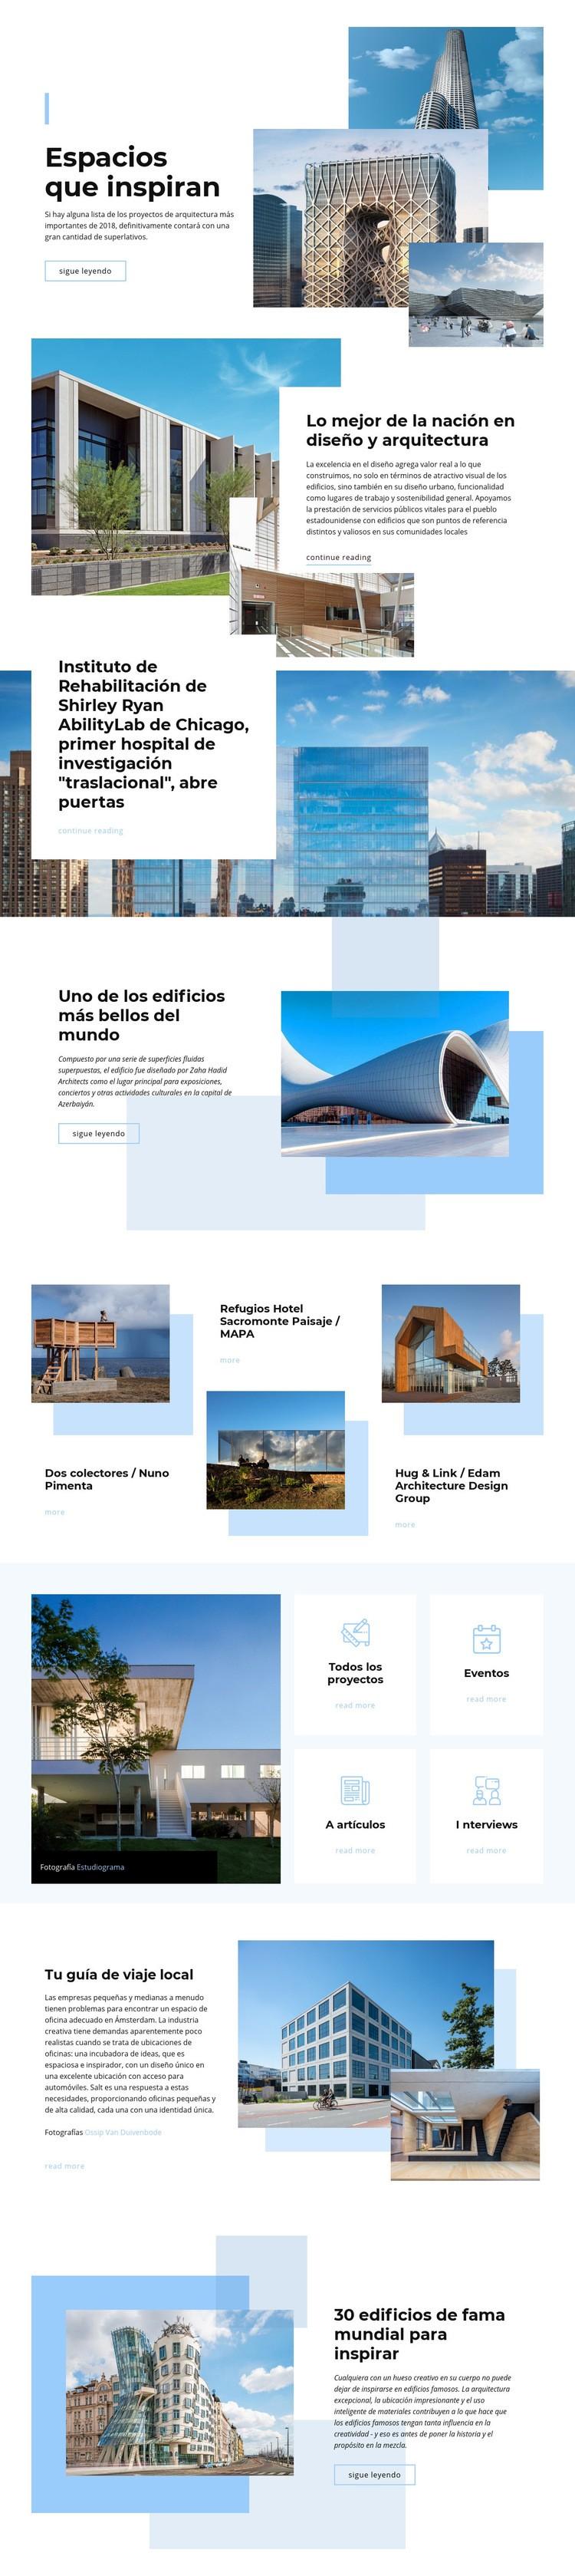 Espacios que inspiran Plantilla de sitio web